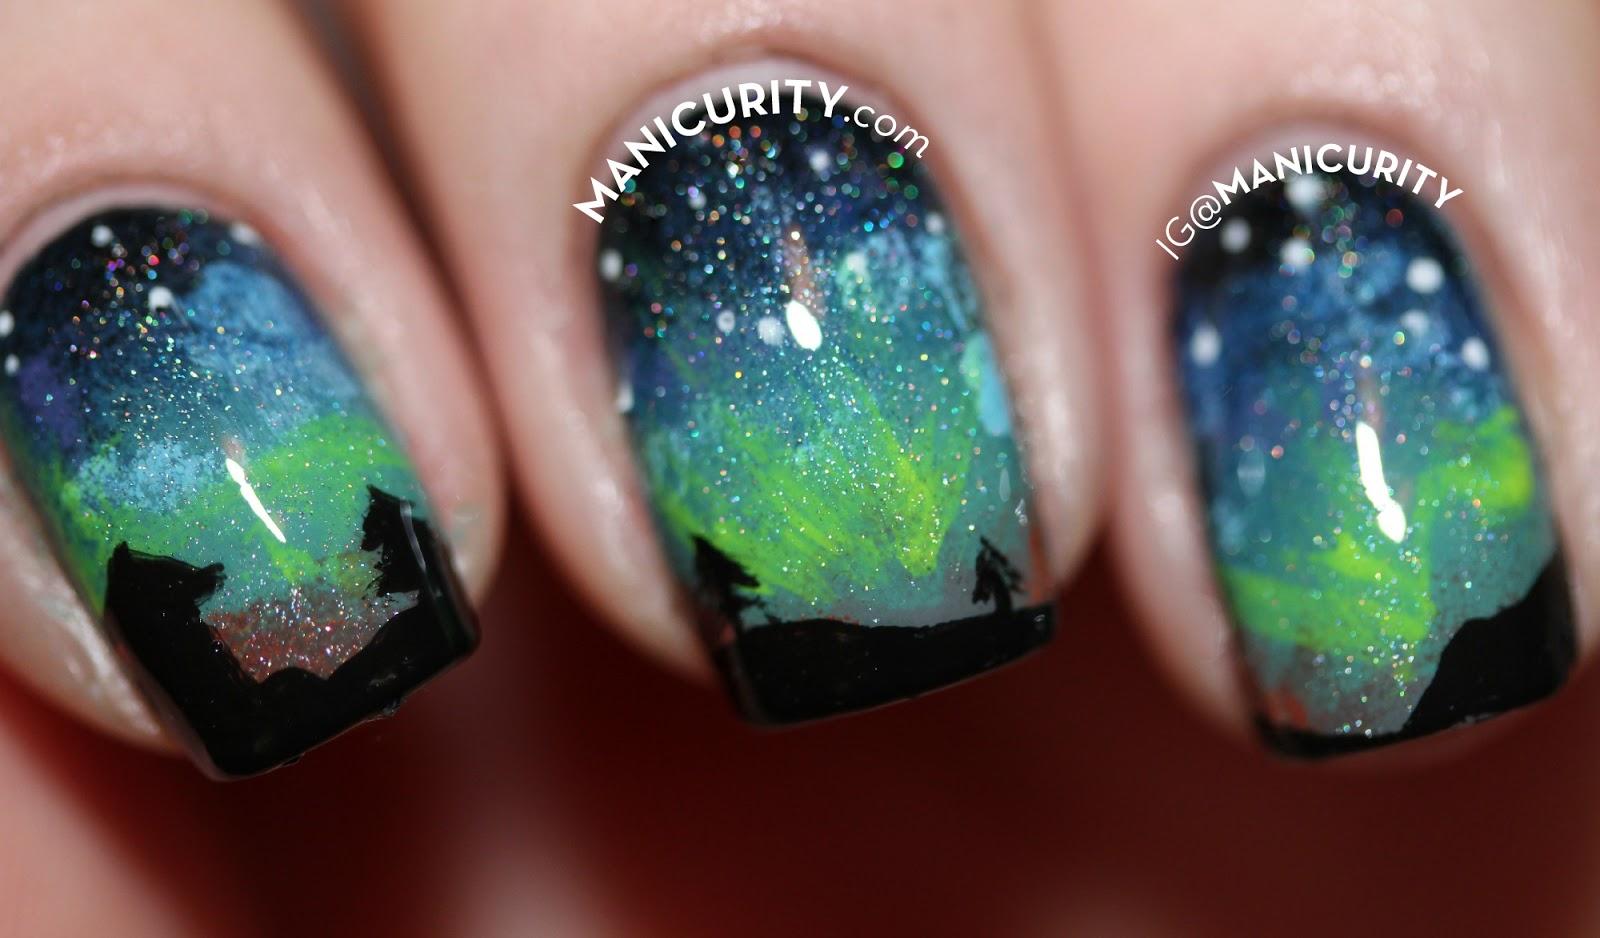 The Digit-al Dozen: Aurora Borealis Nail Art - The Northern Lights Nails | Manicurity.com